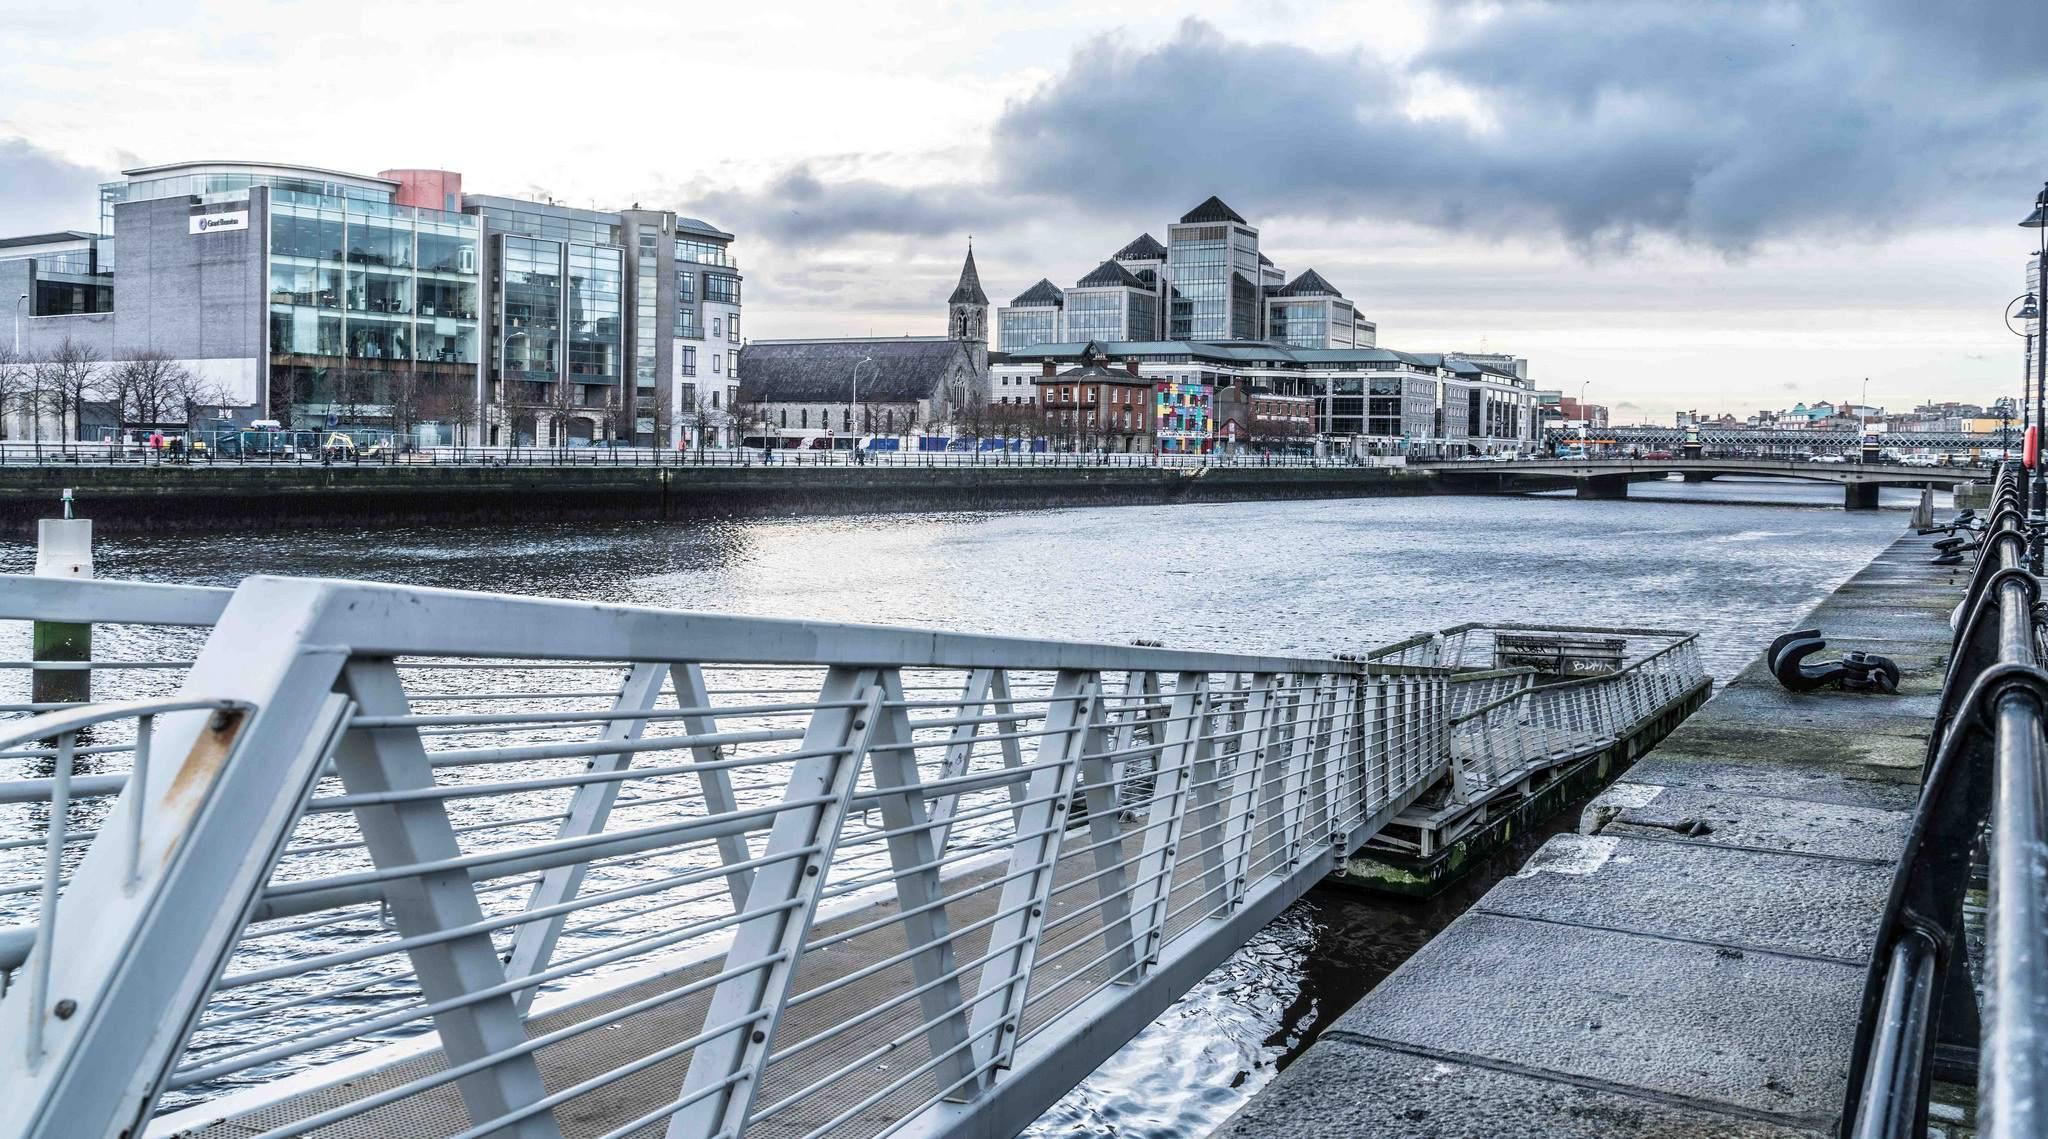 dublin docklands14 Walking Around Dublin Docklands by Marphy